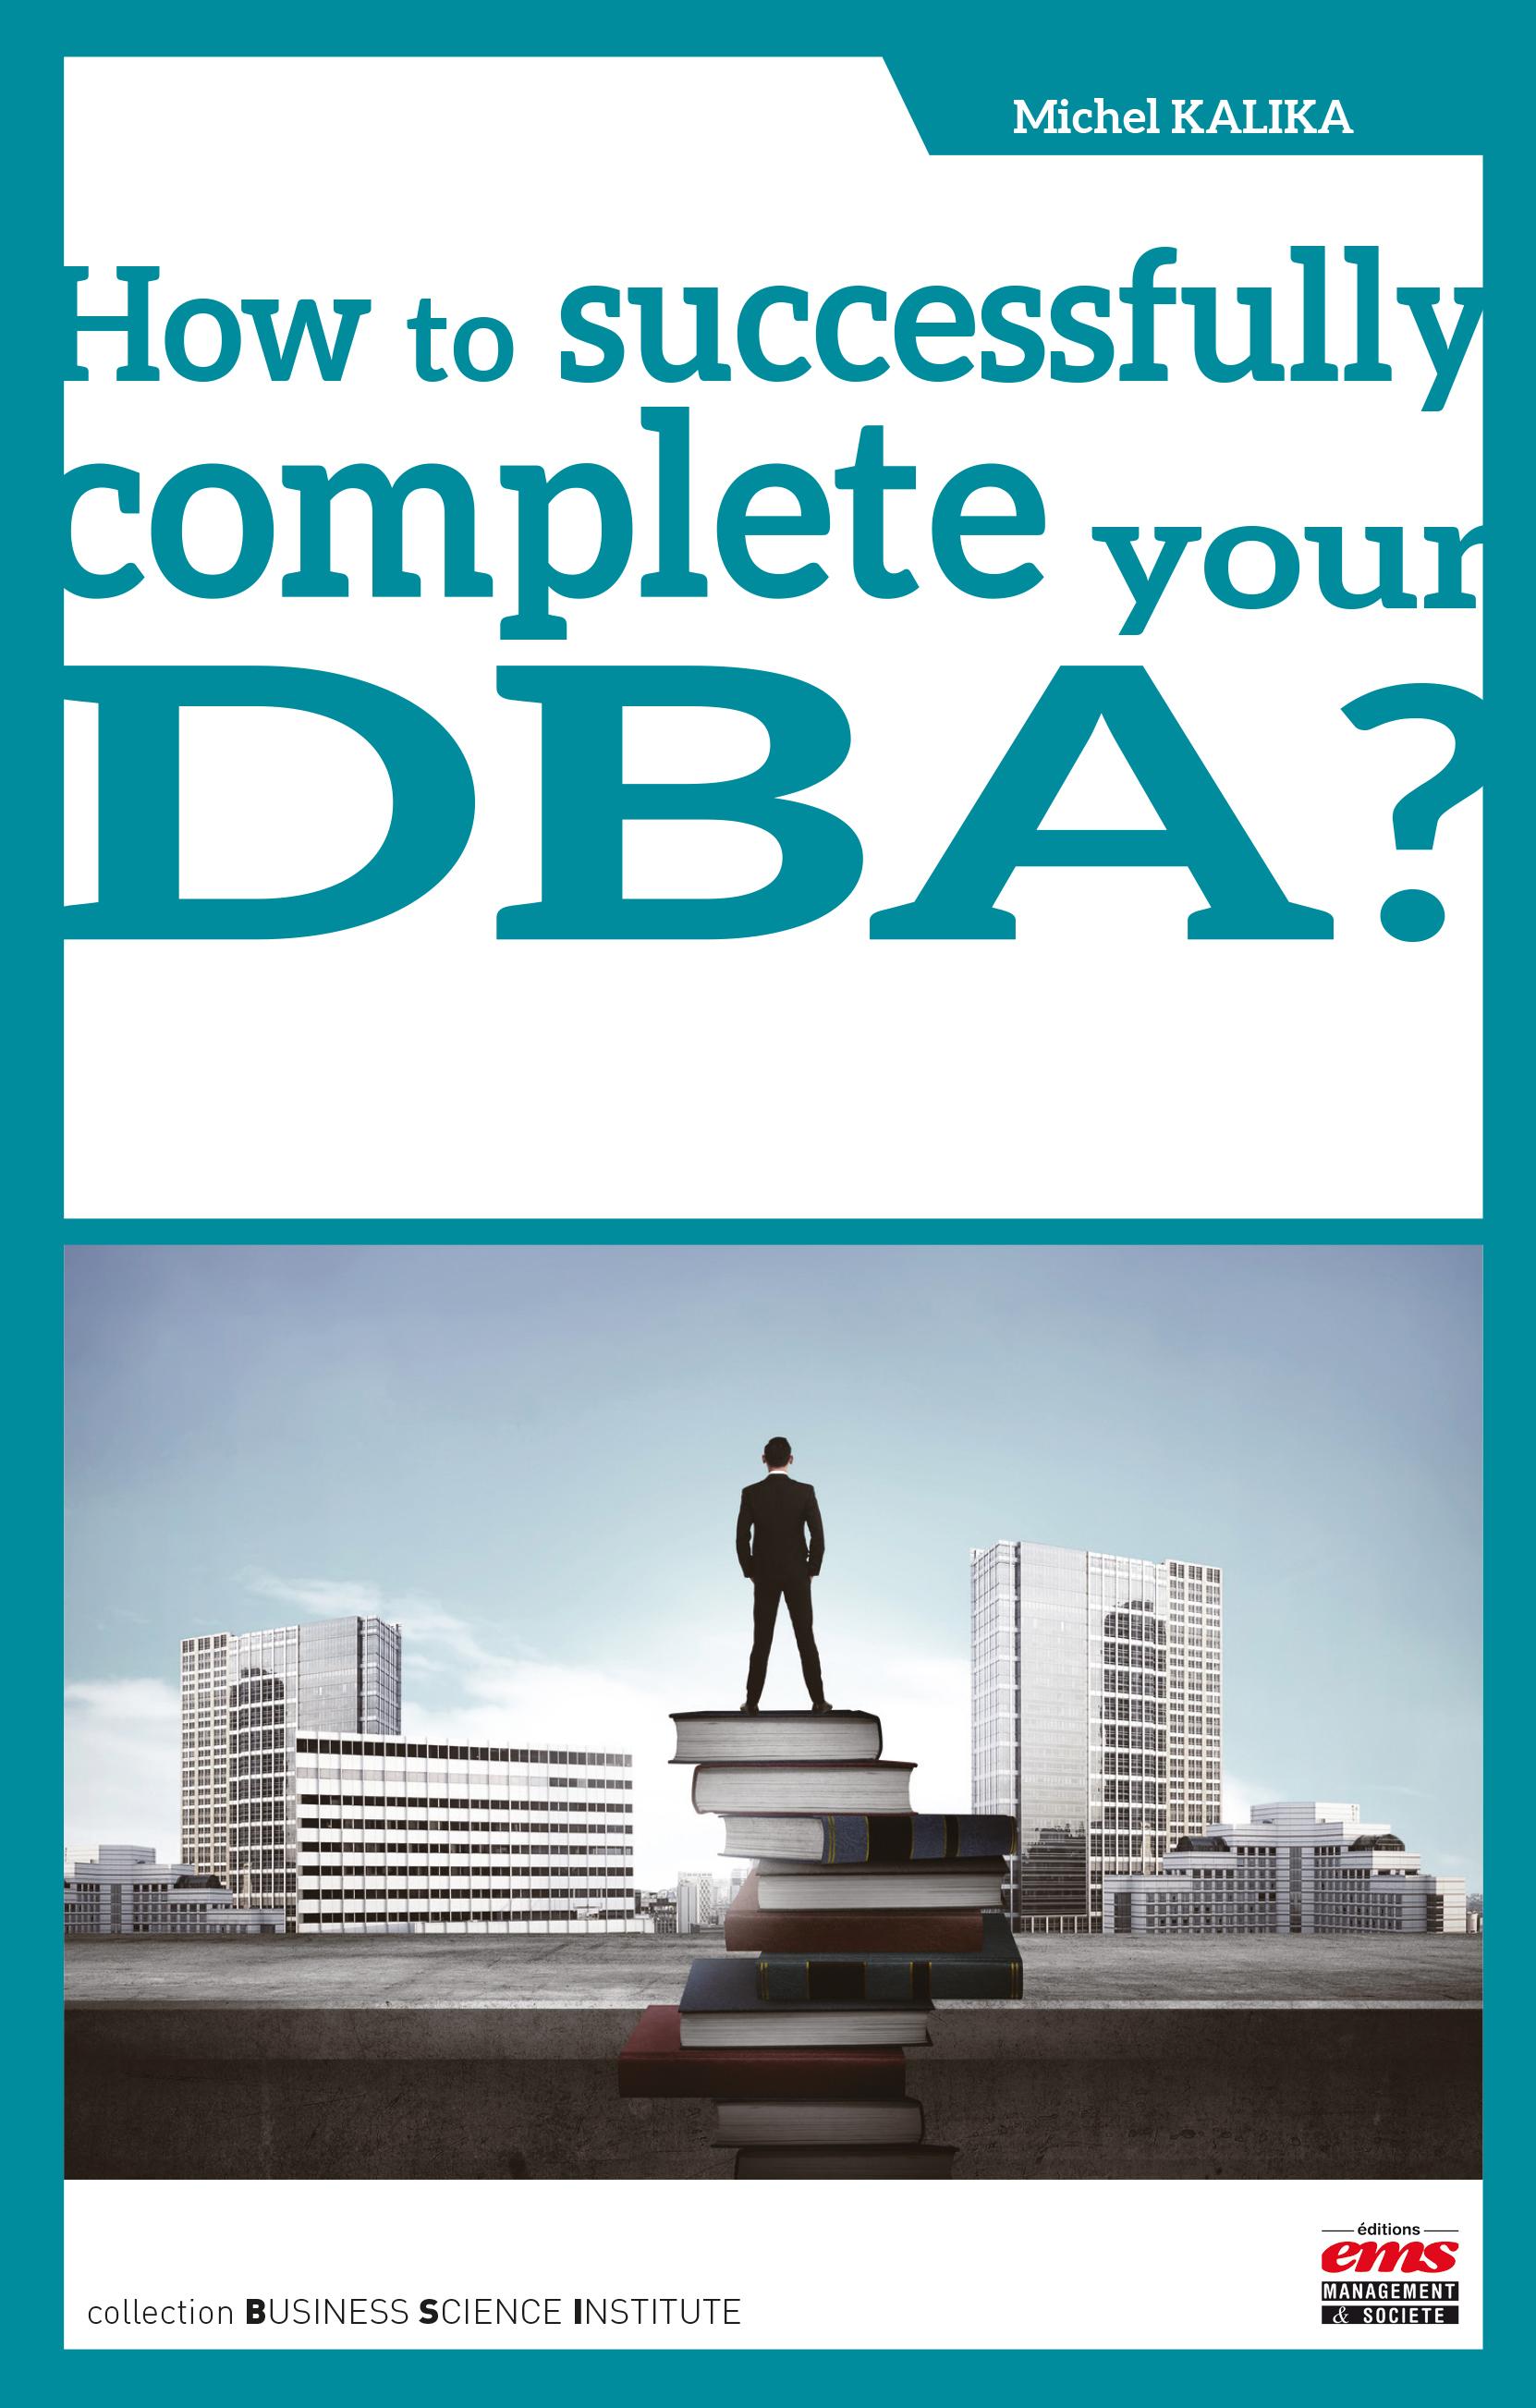 DBA Dissertation Subject areas